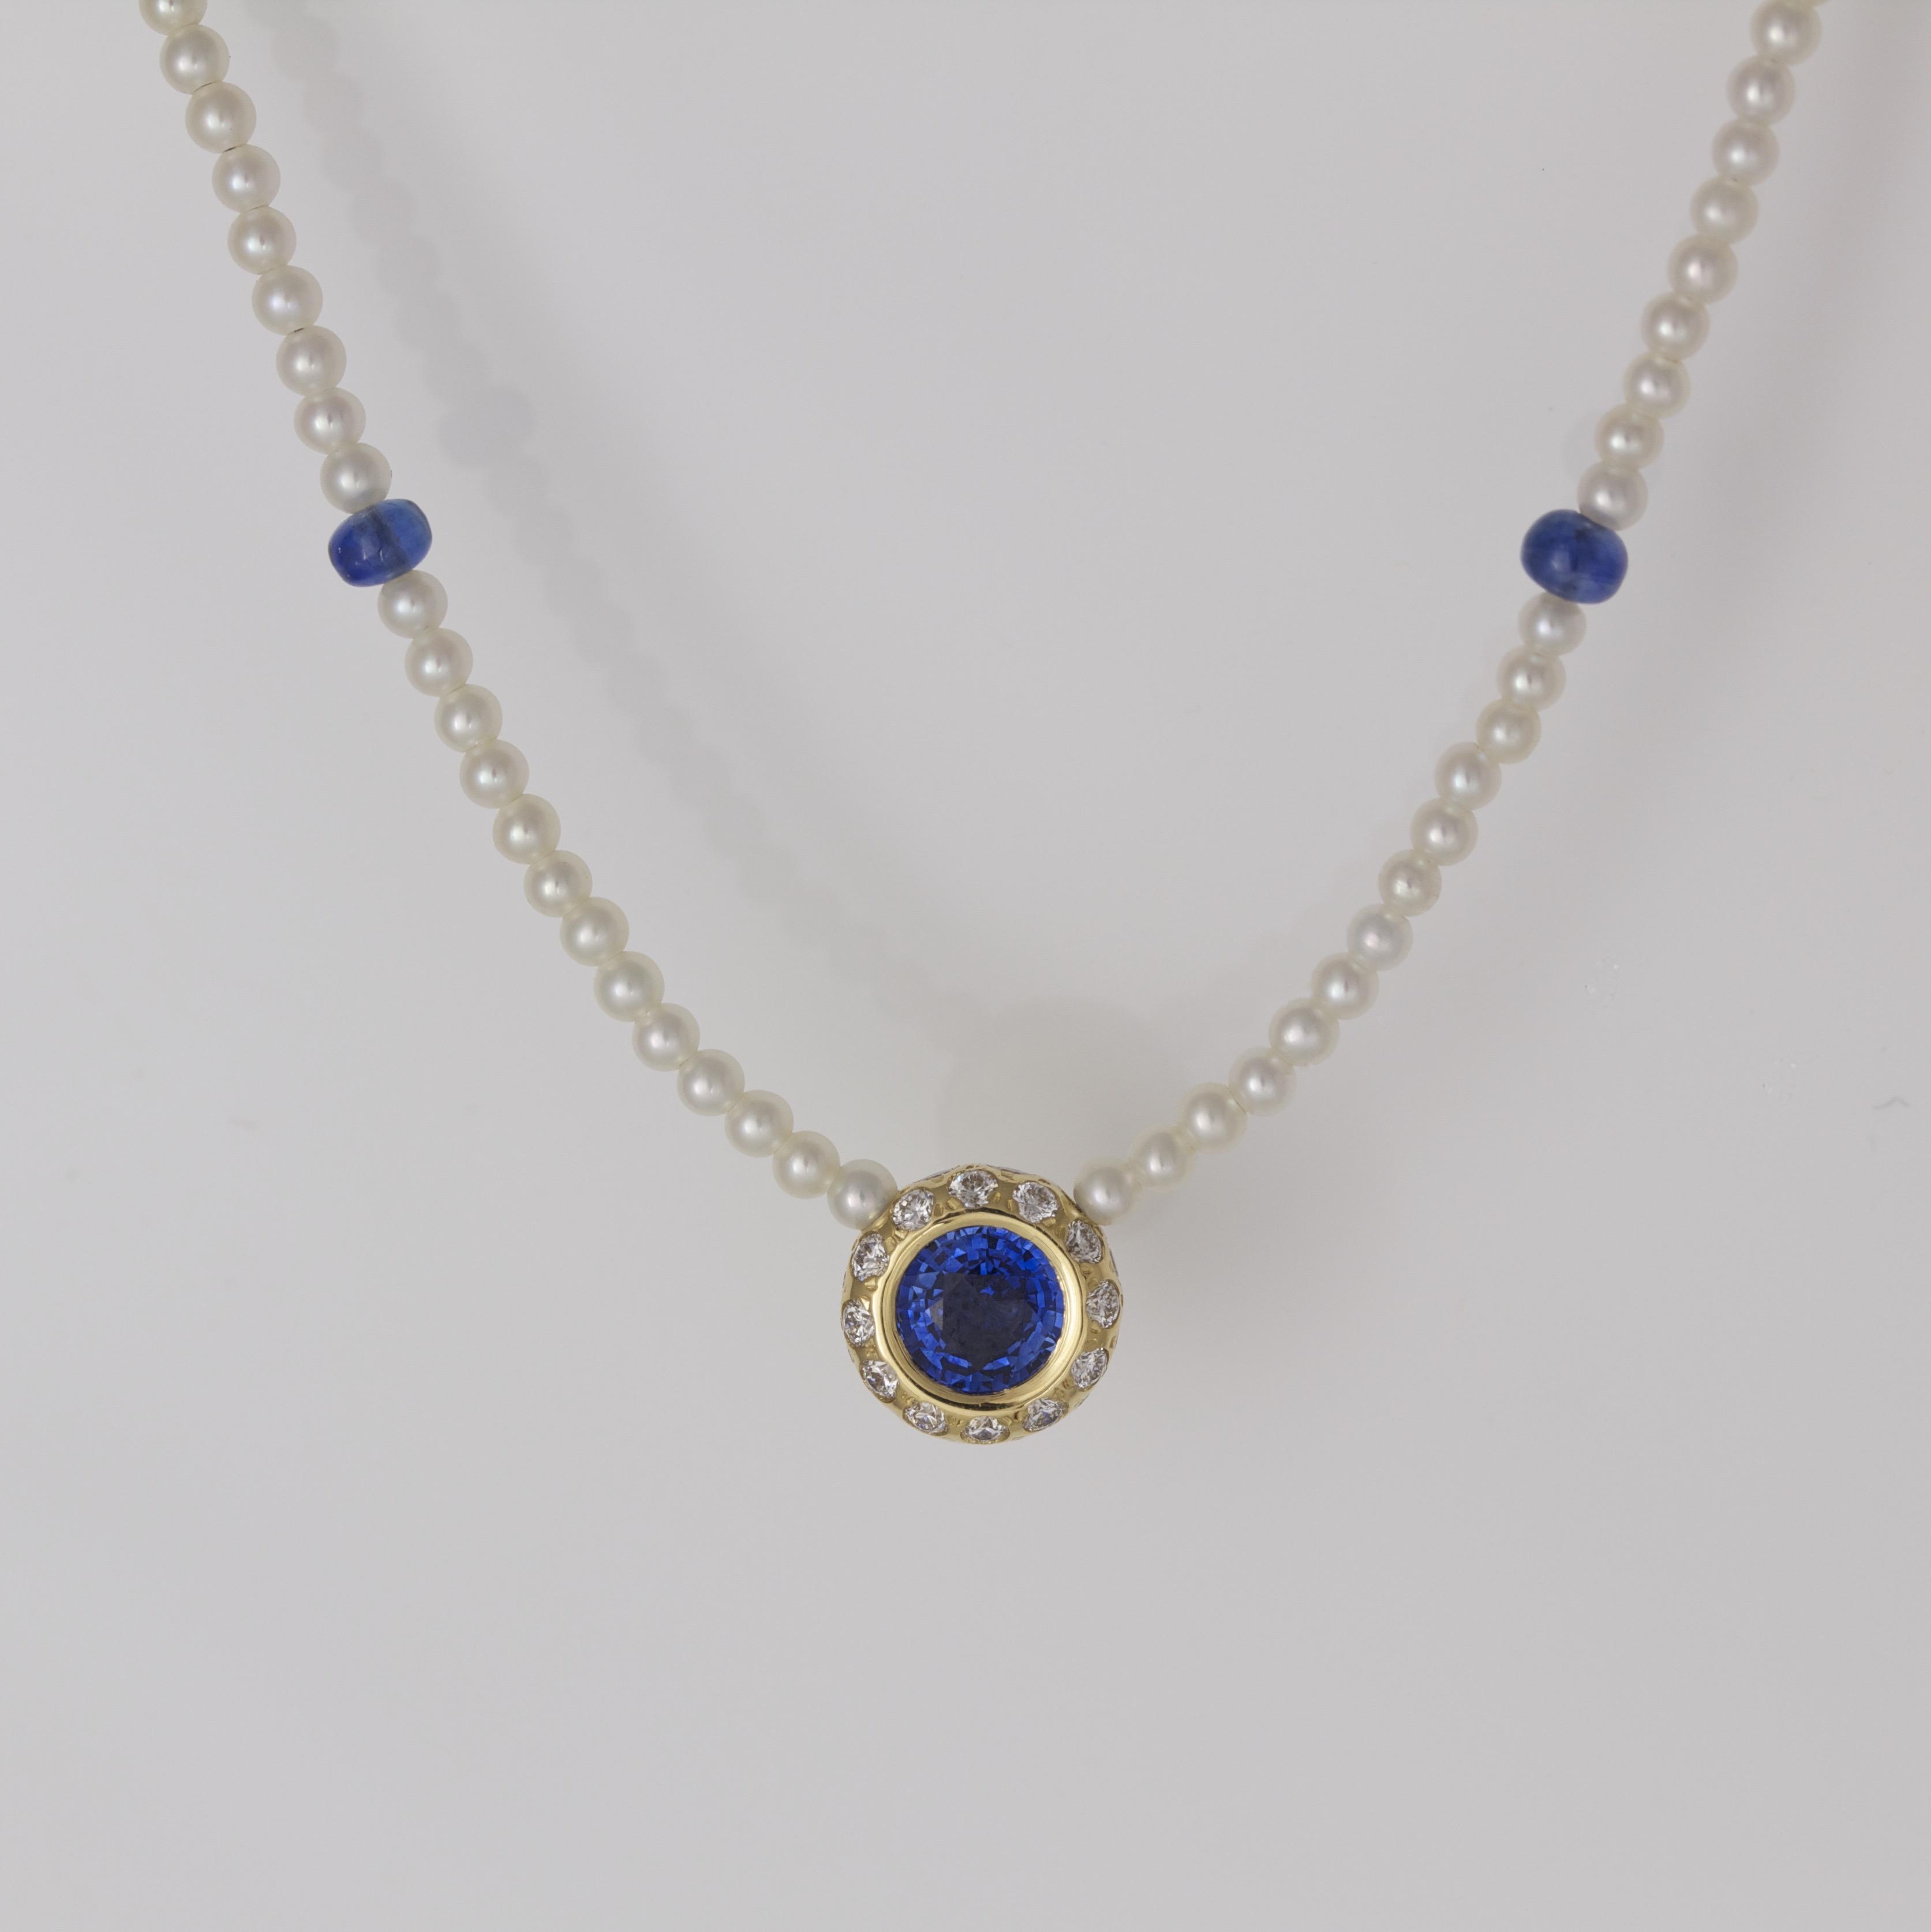 Sapphire with diamond halo necklace DAVID ASHTON